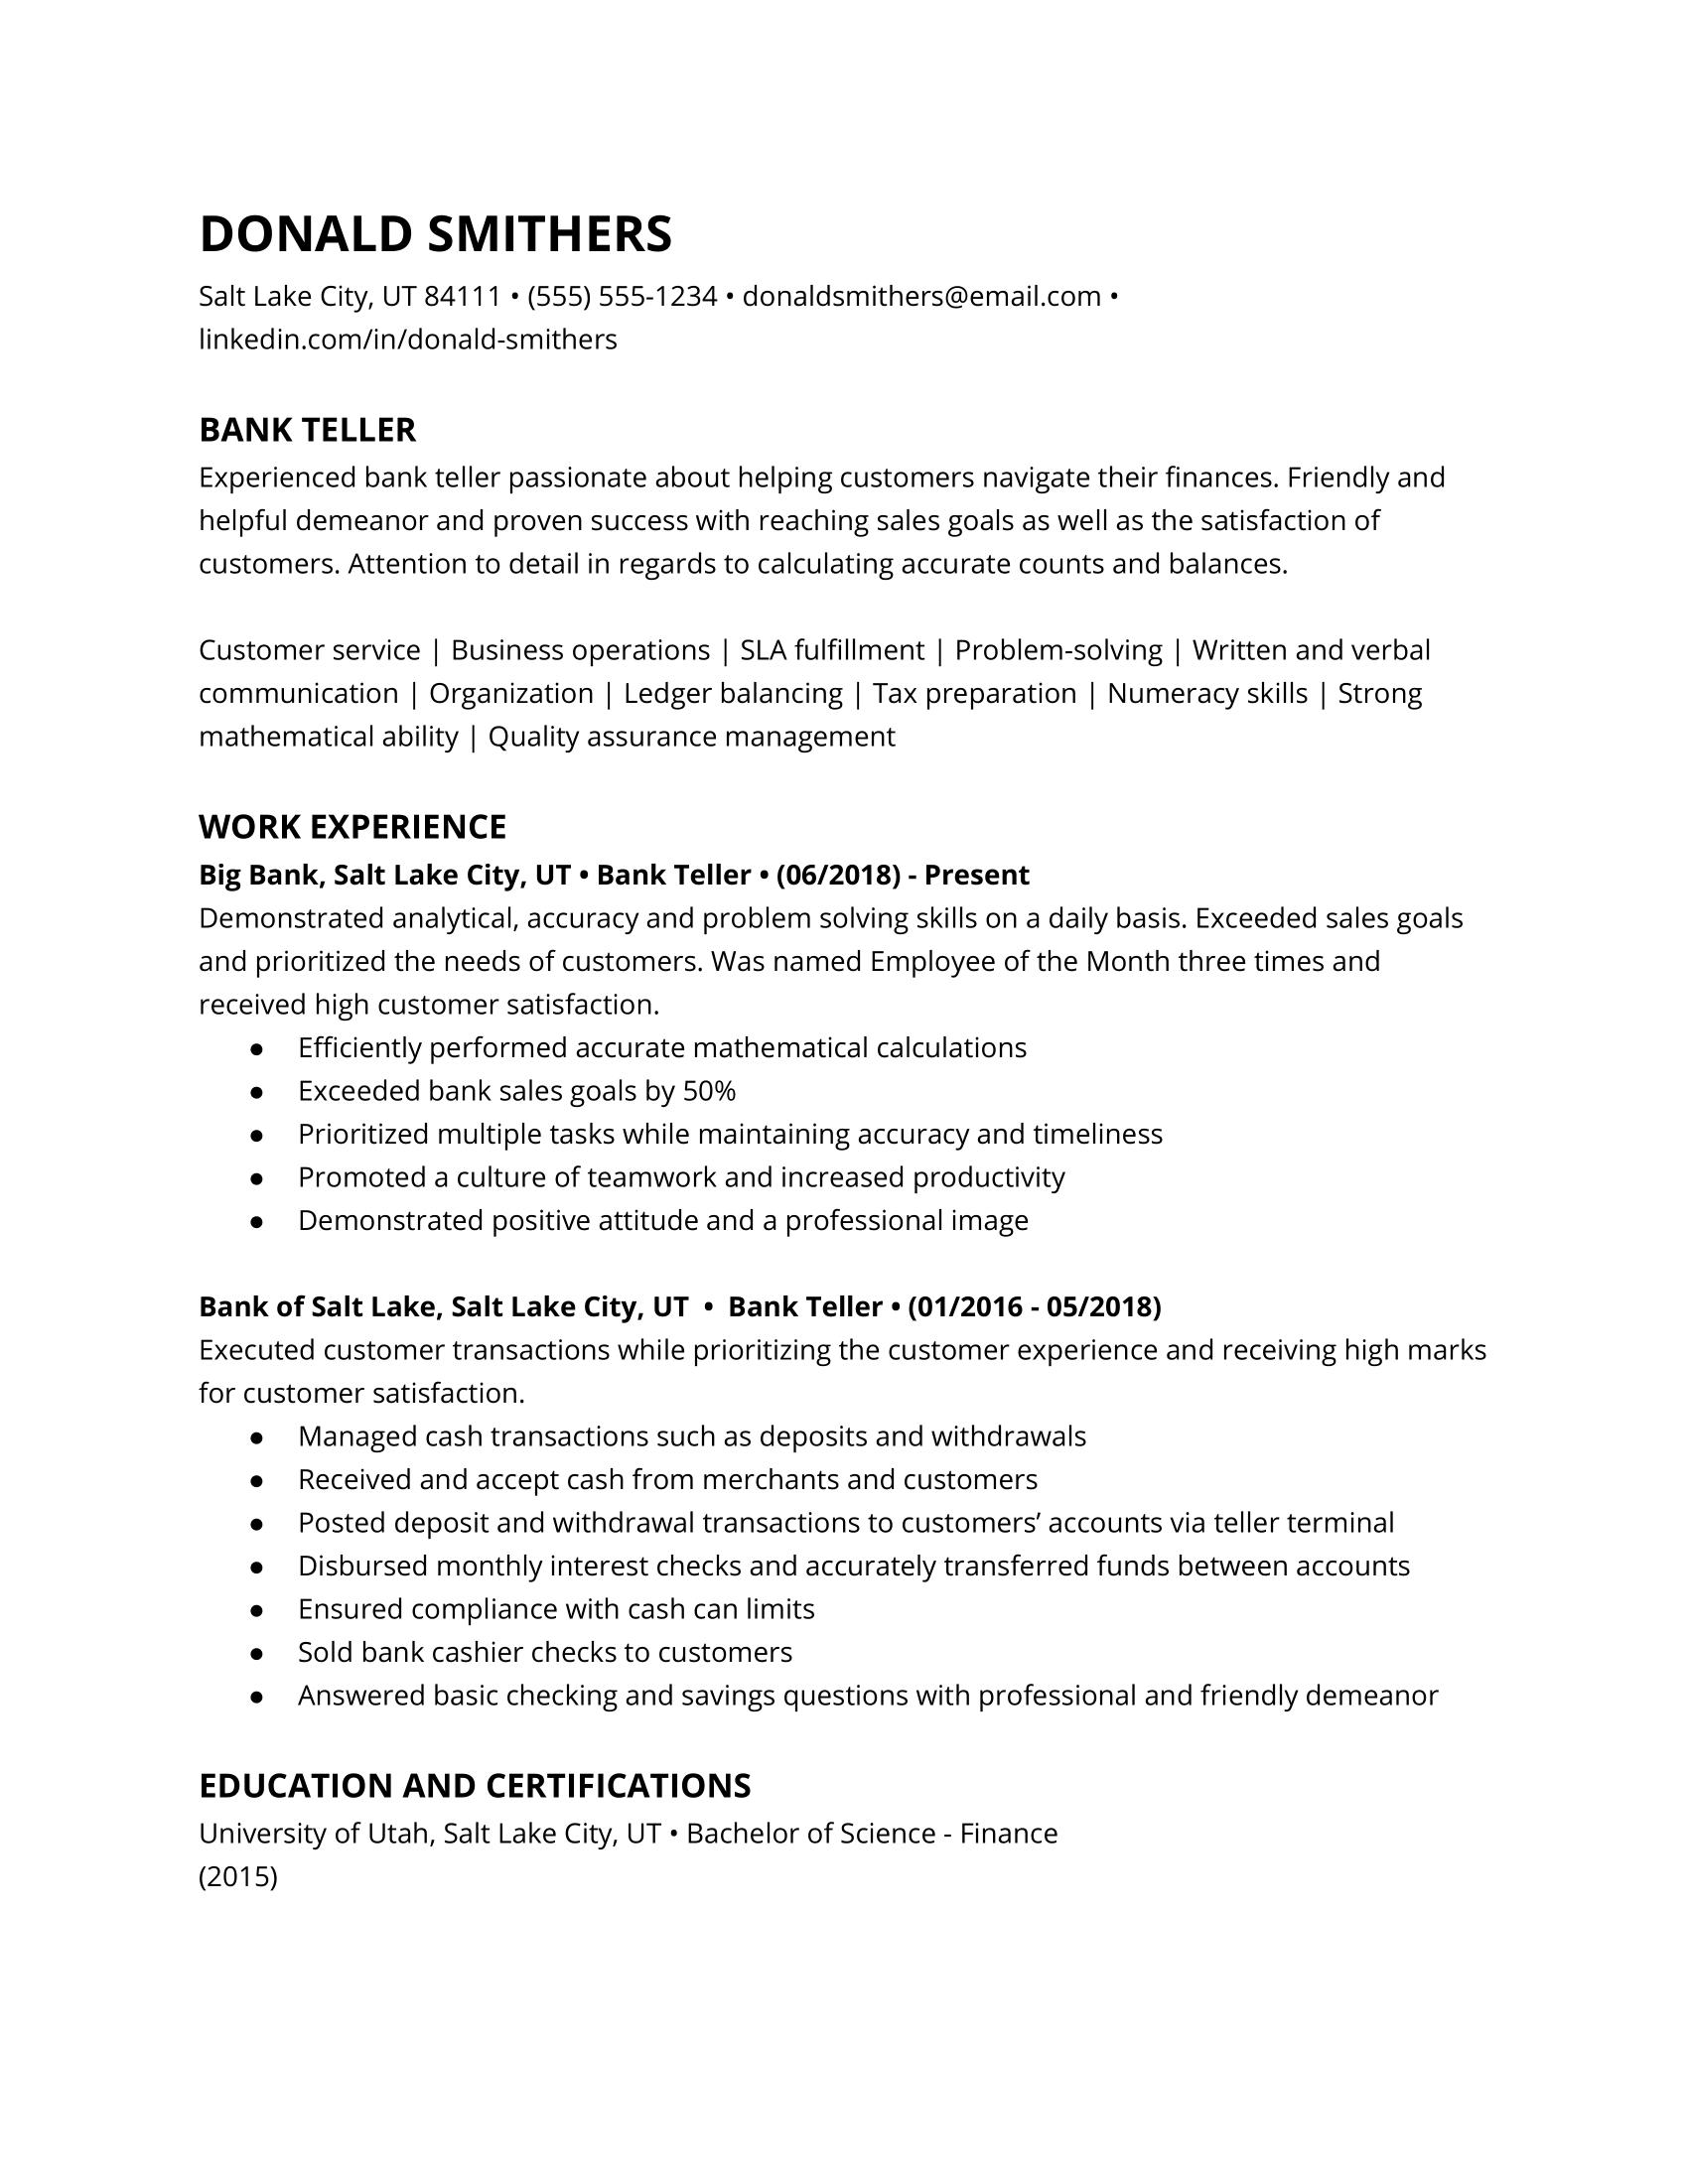 Bank Teller Resume Example 2